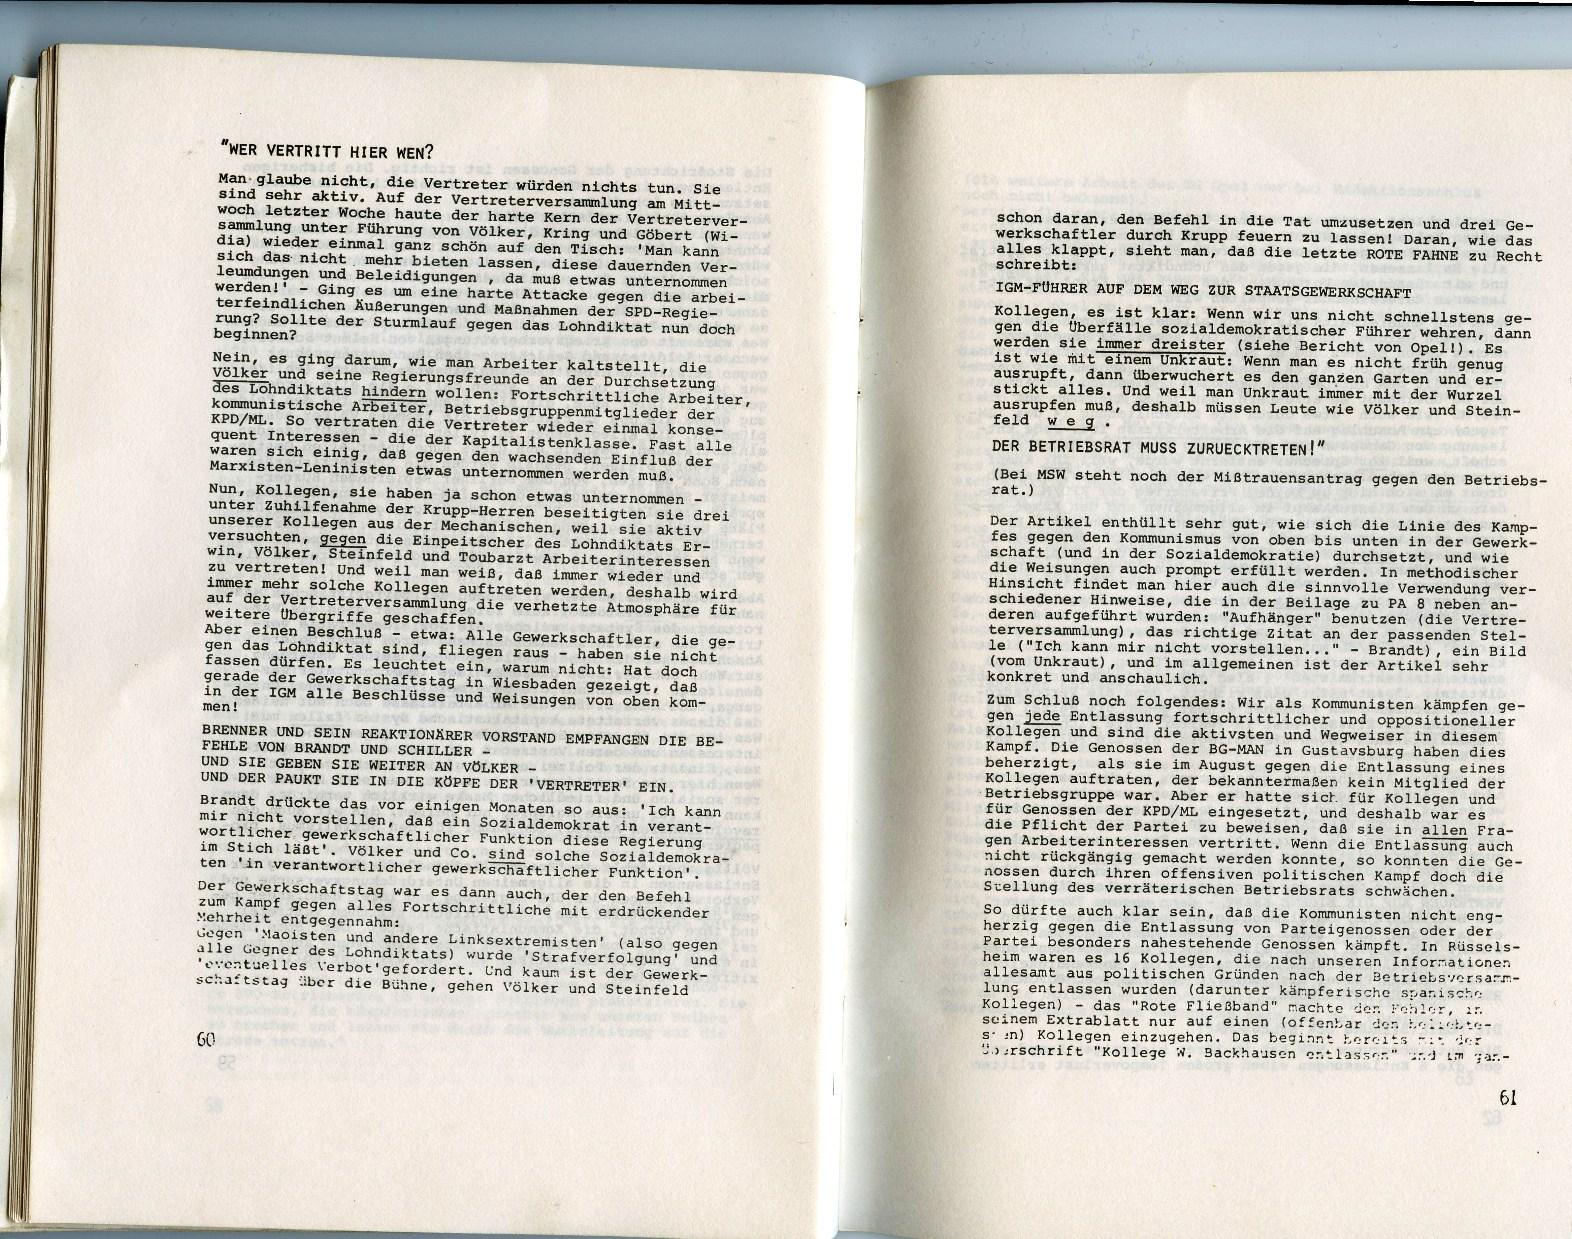 ZB_Parteiarbeiter_1971_09_31